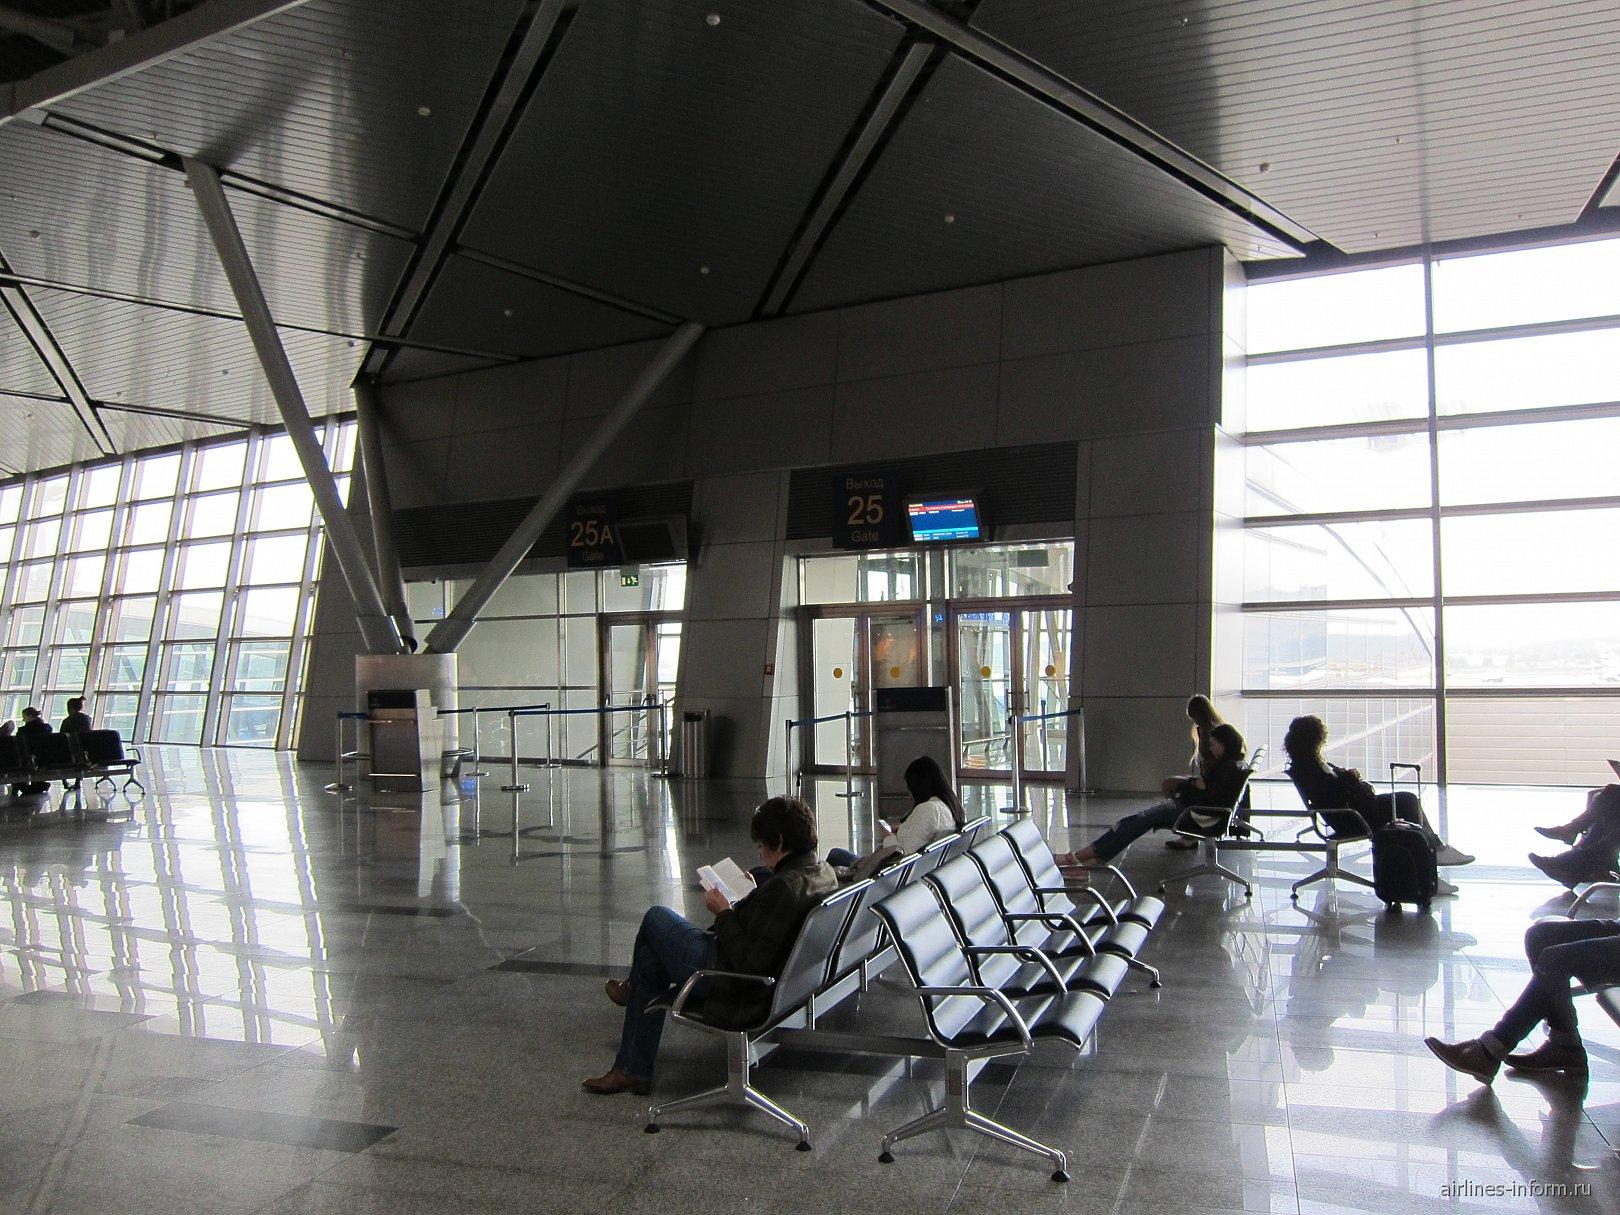 Выход на посадку в терминале А аэропорта Внуково